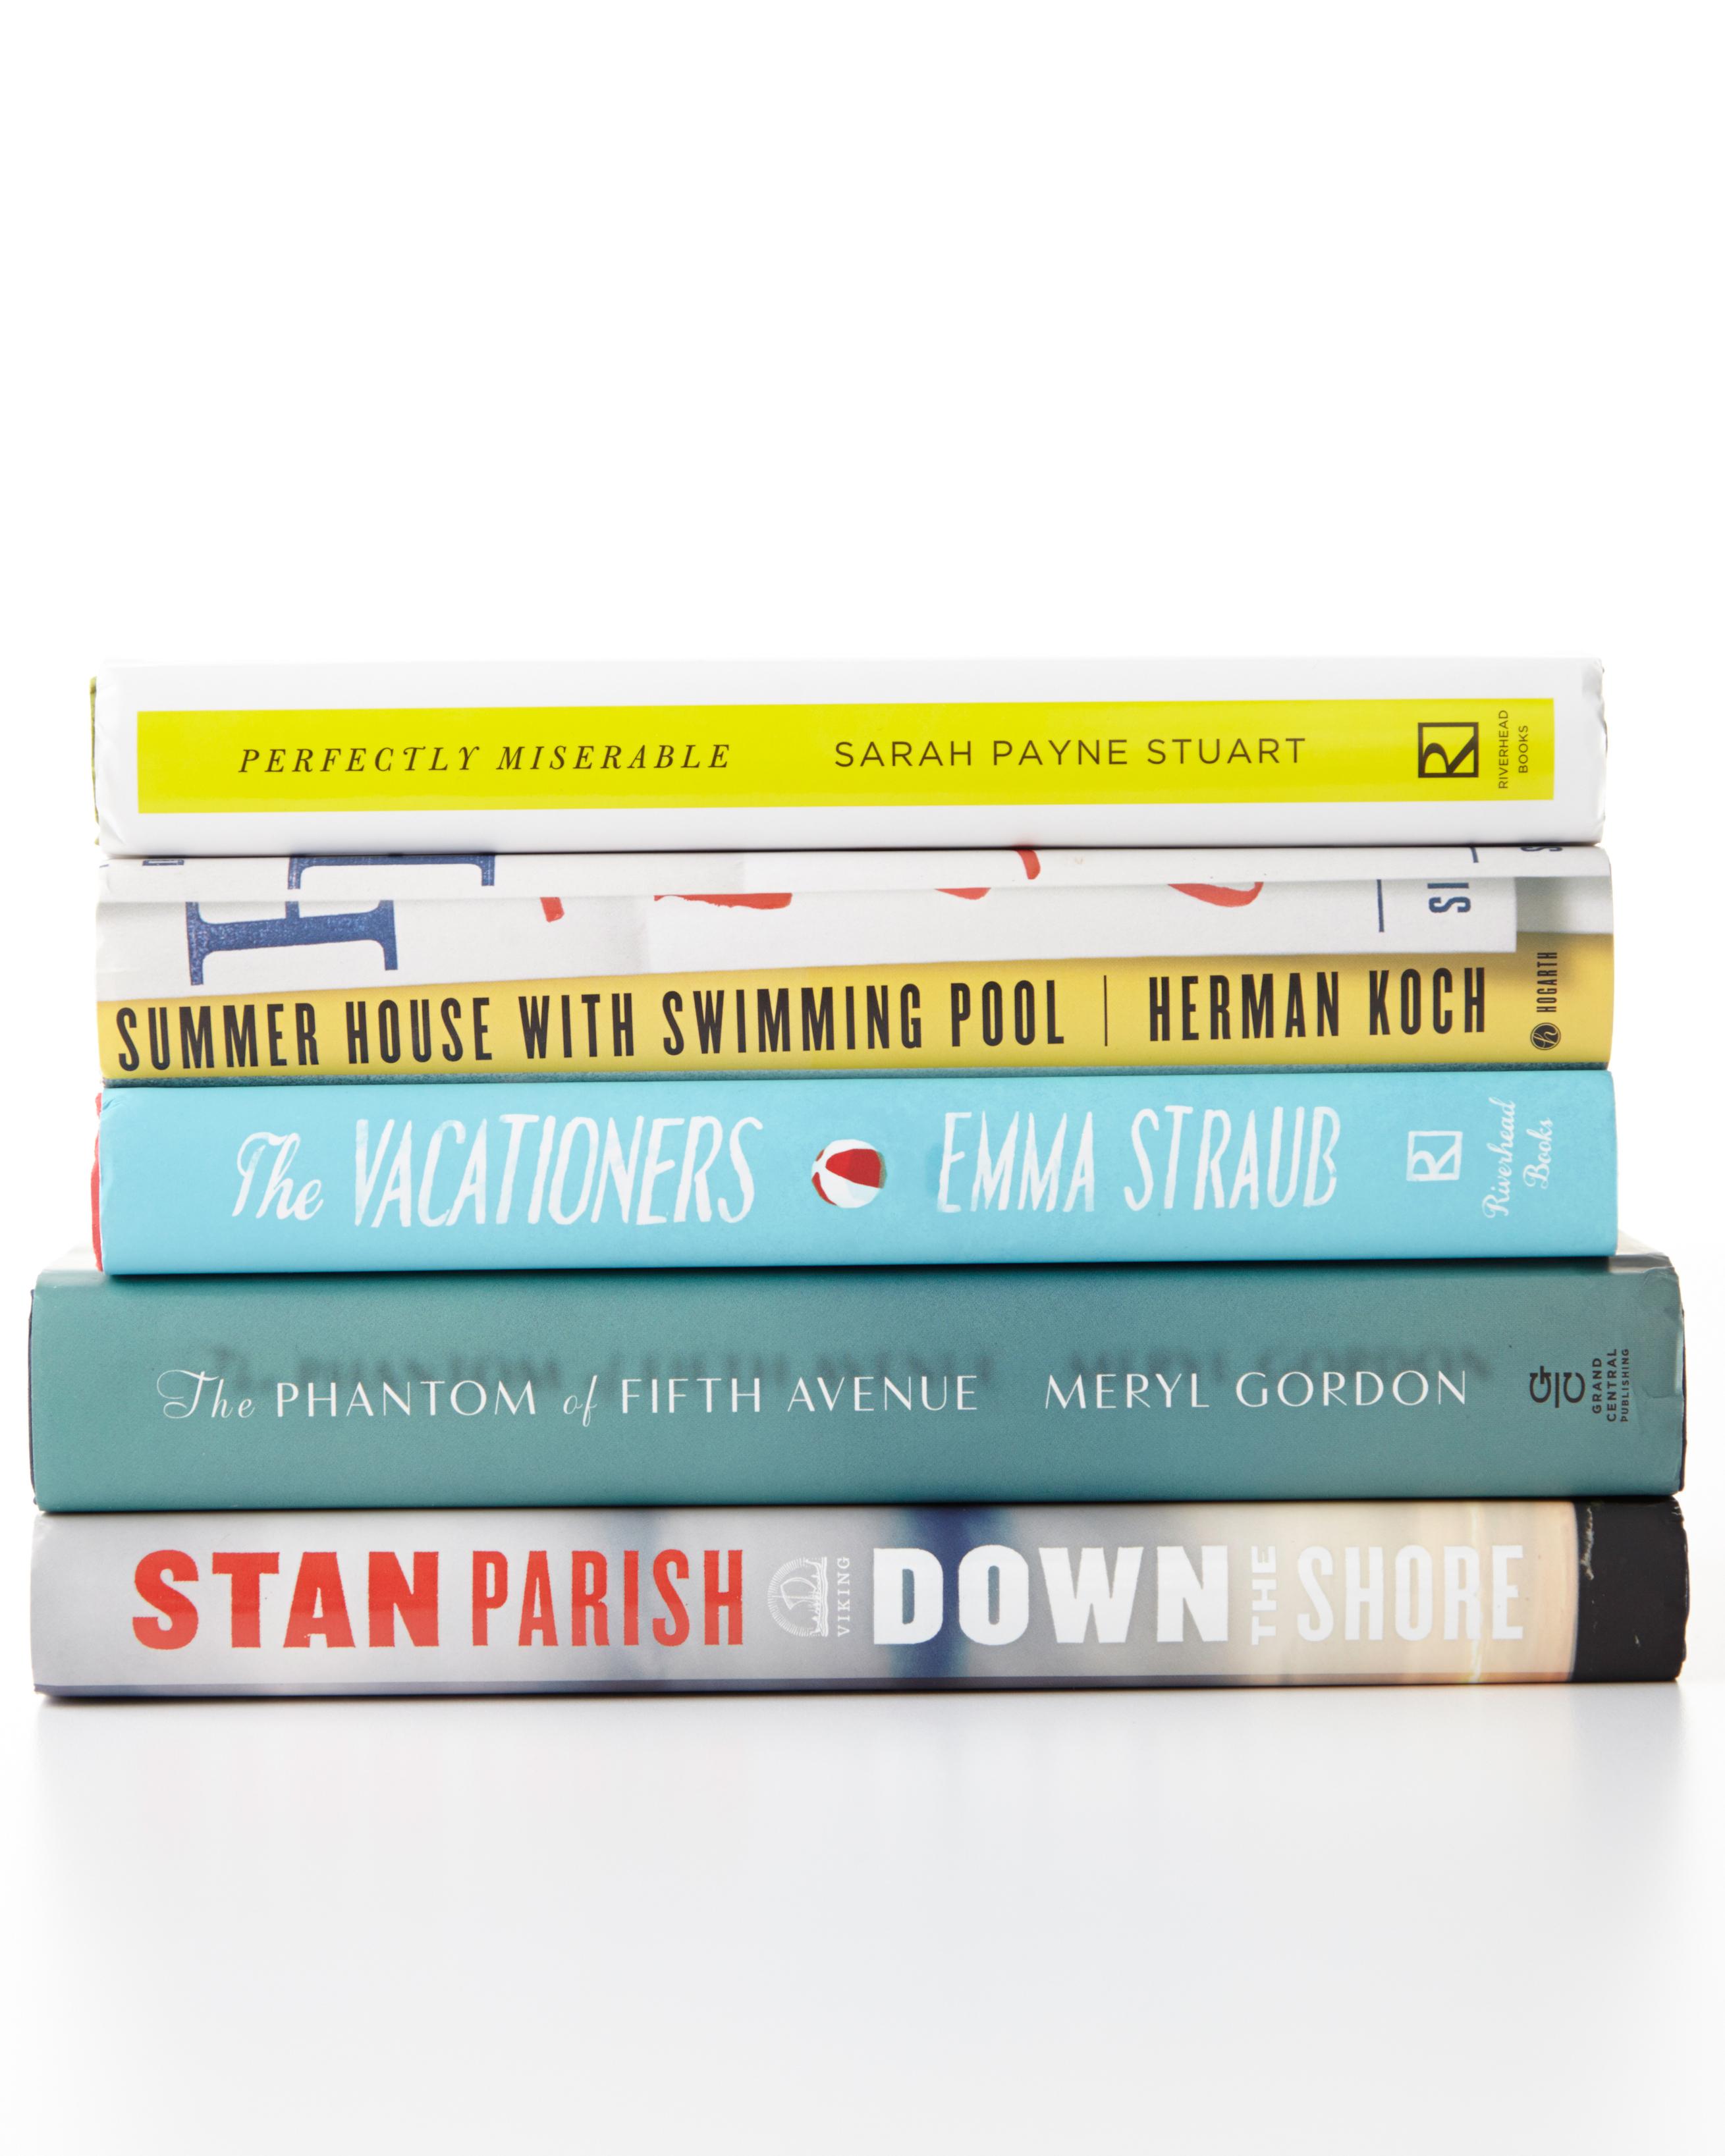 honeymoon-book-ideas-stacked-0614.jpg